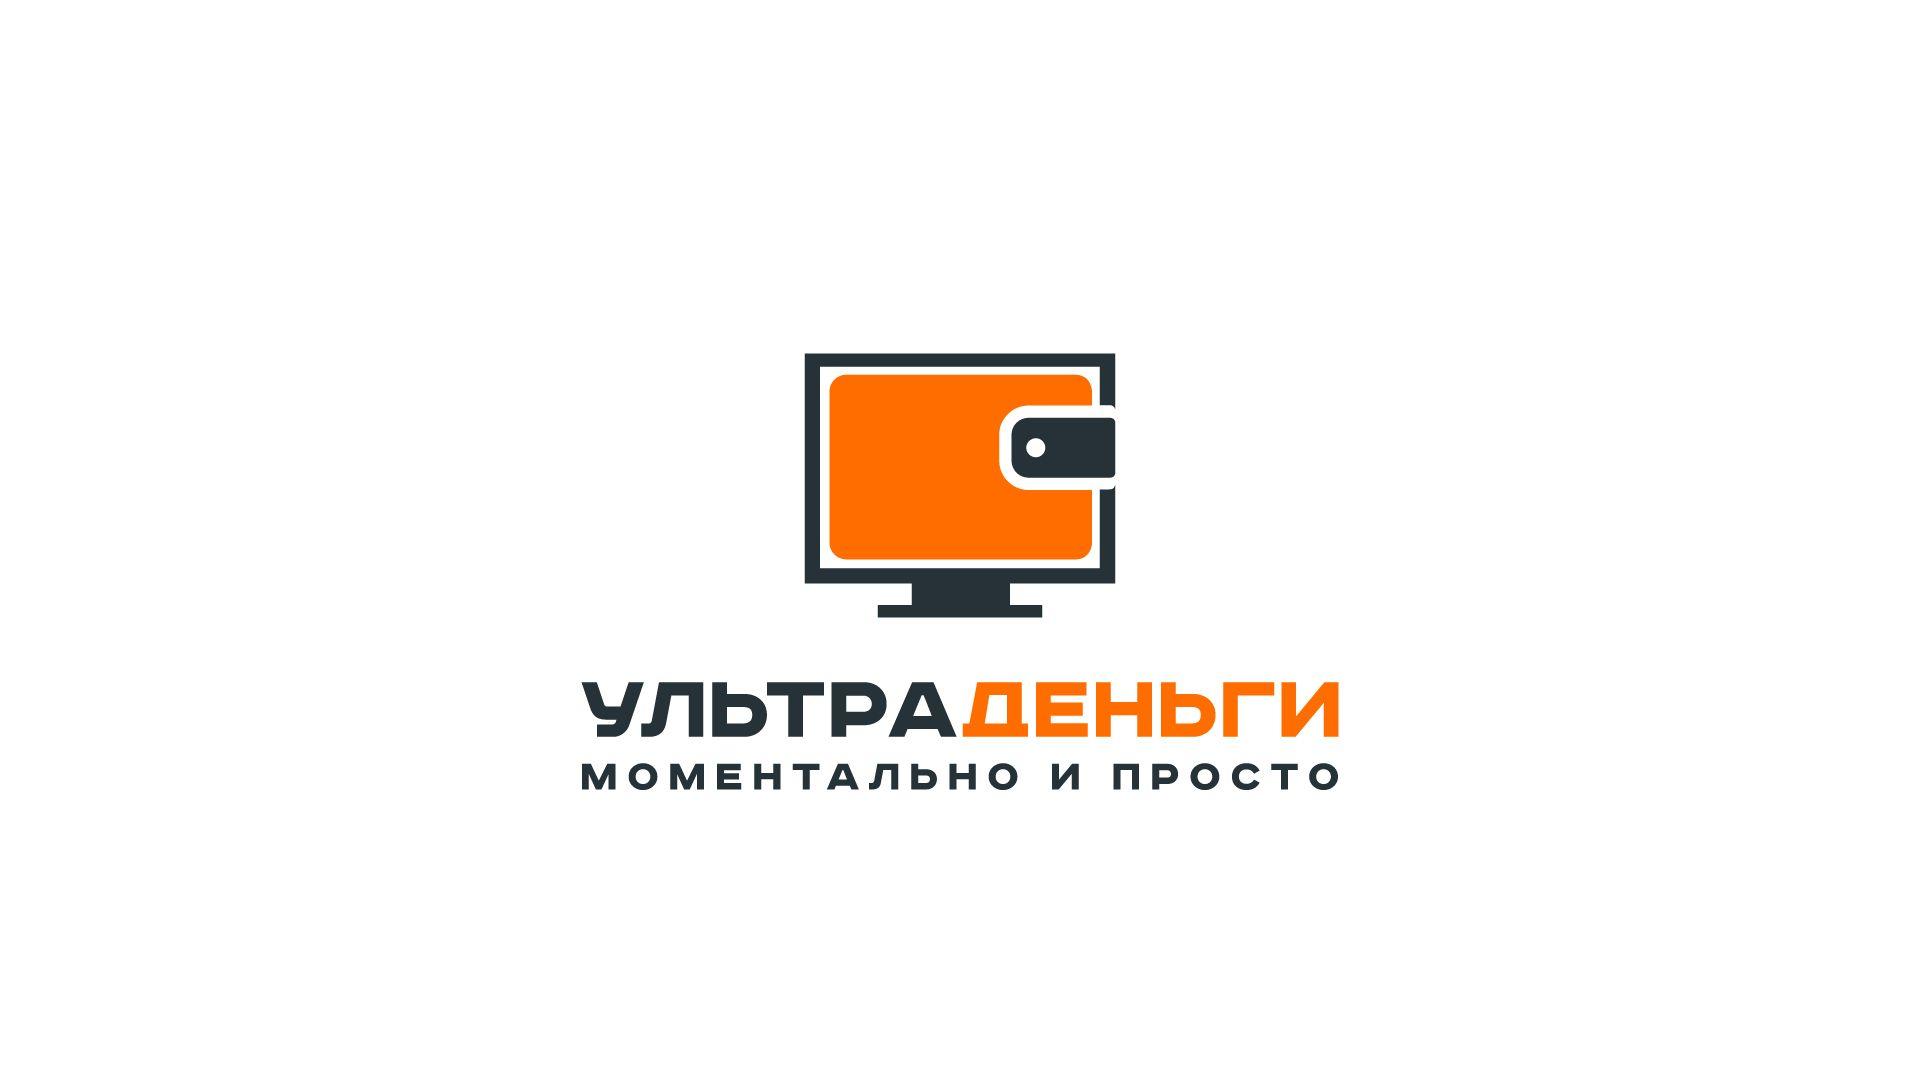 Логотип для сайта МФО ultra-dengi.ru - дизайнер Advokat72